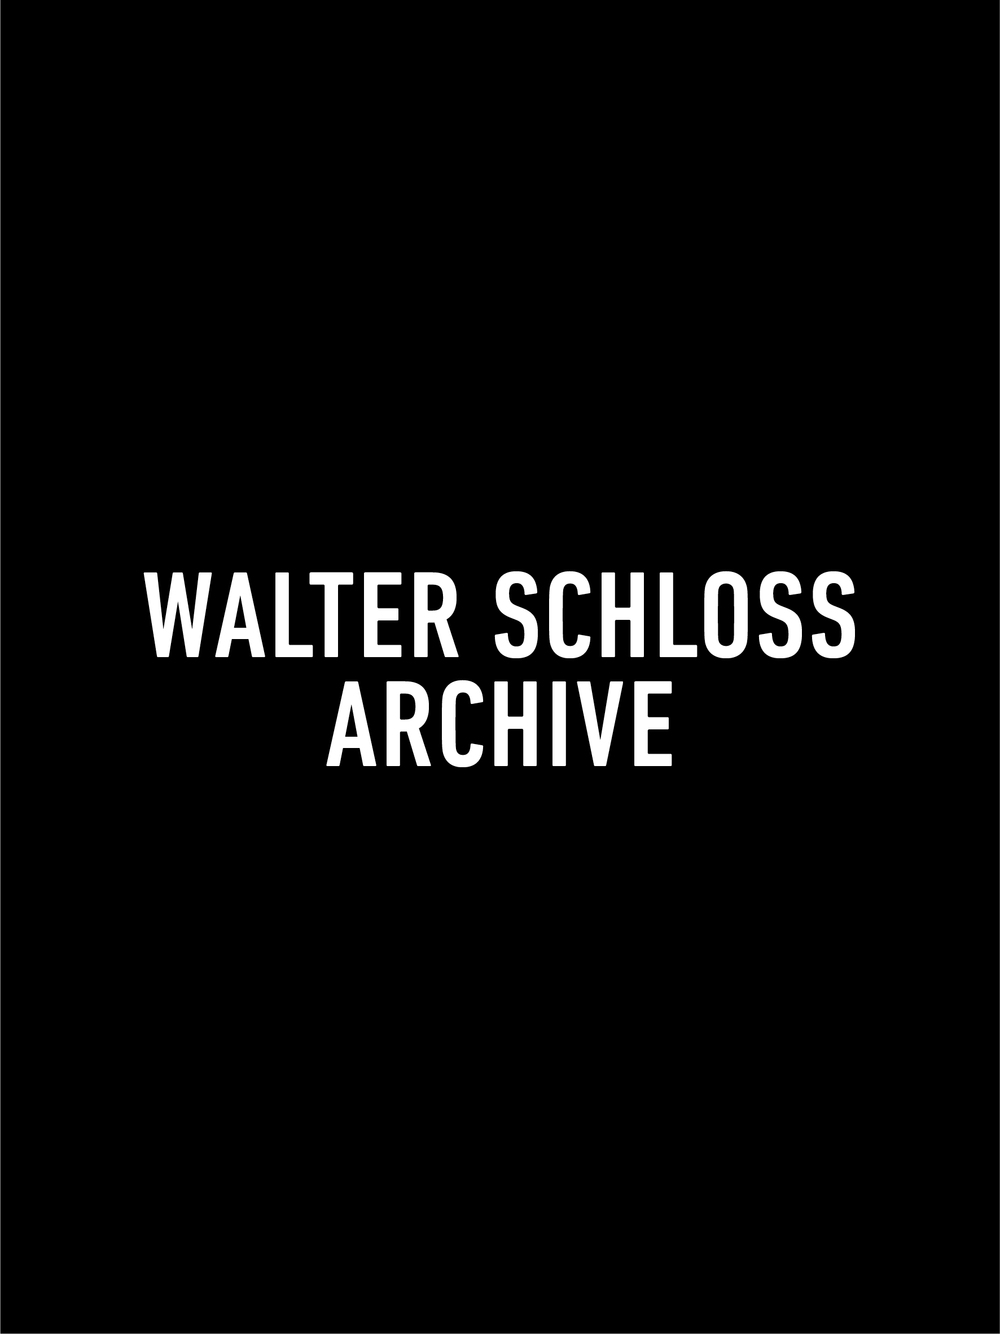 walter archive101.jpg